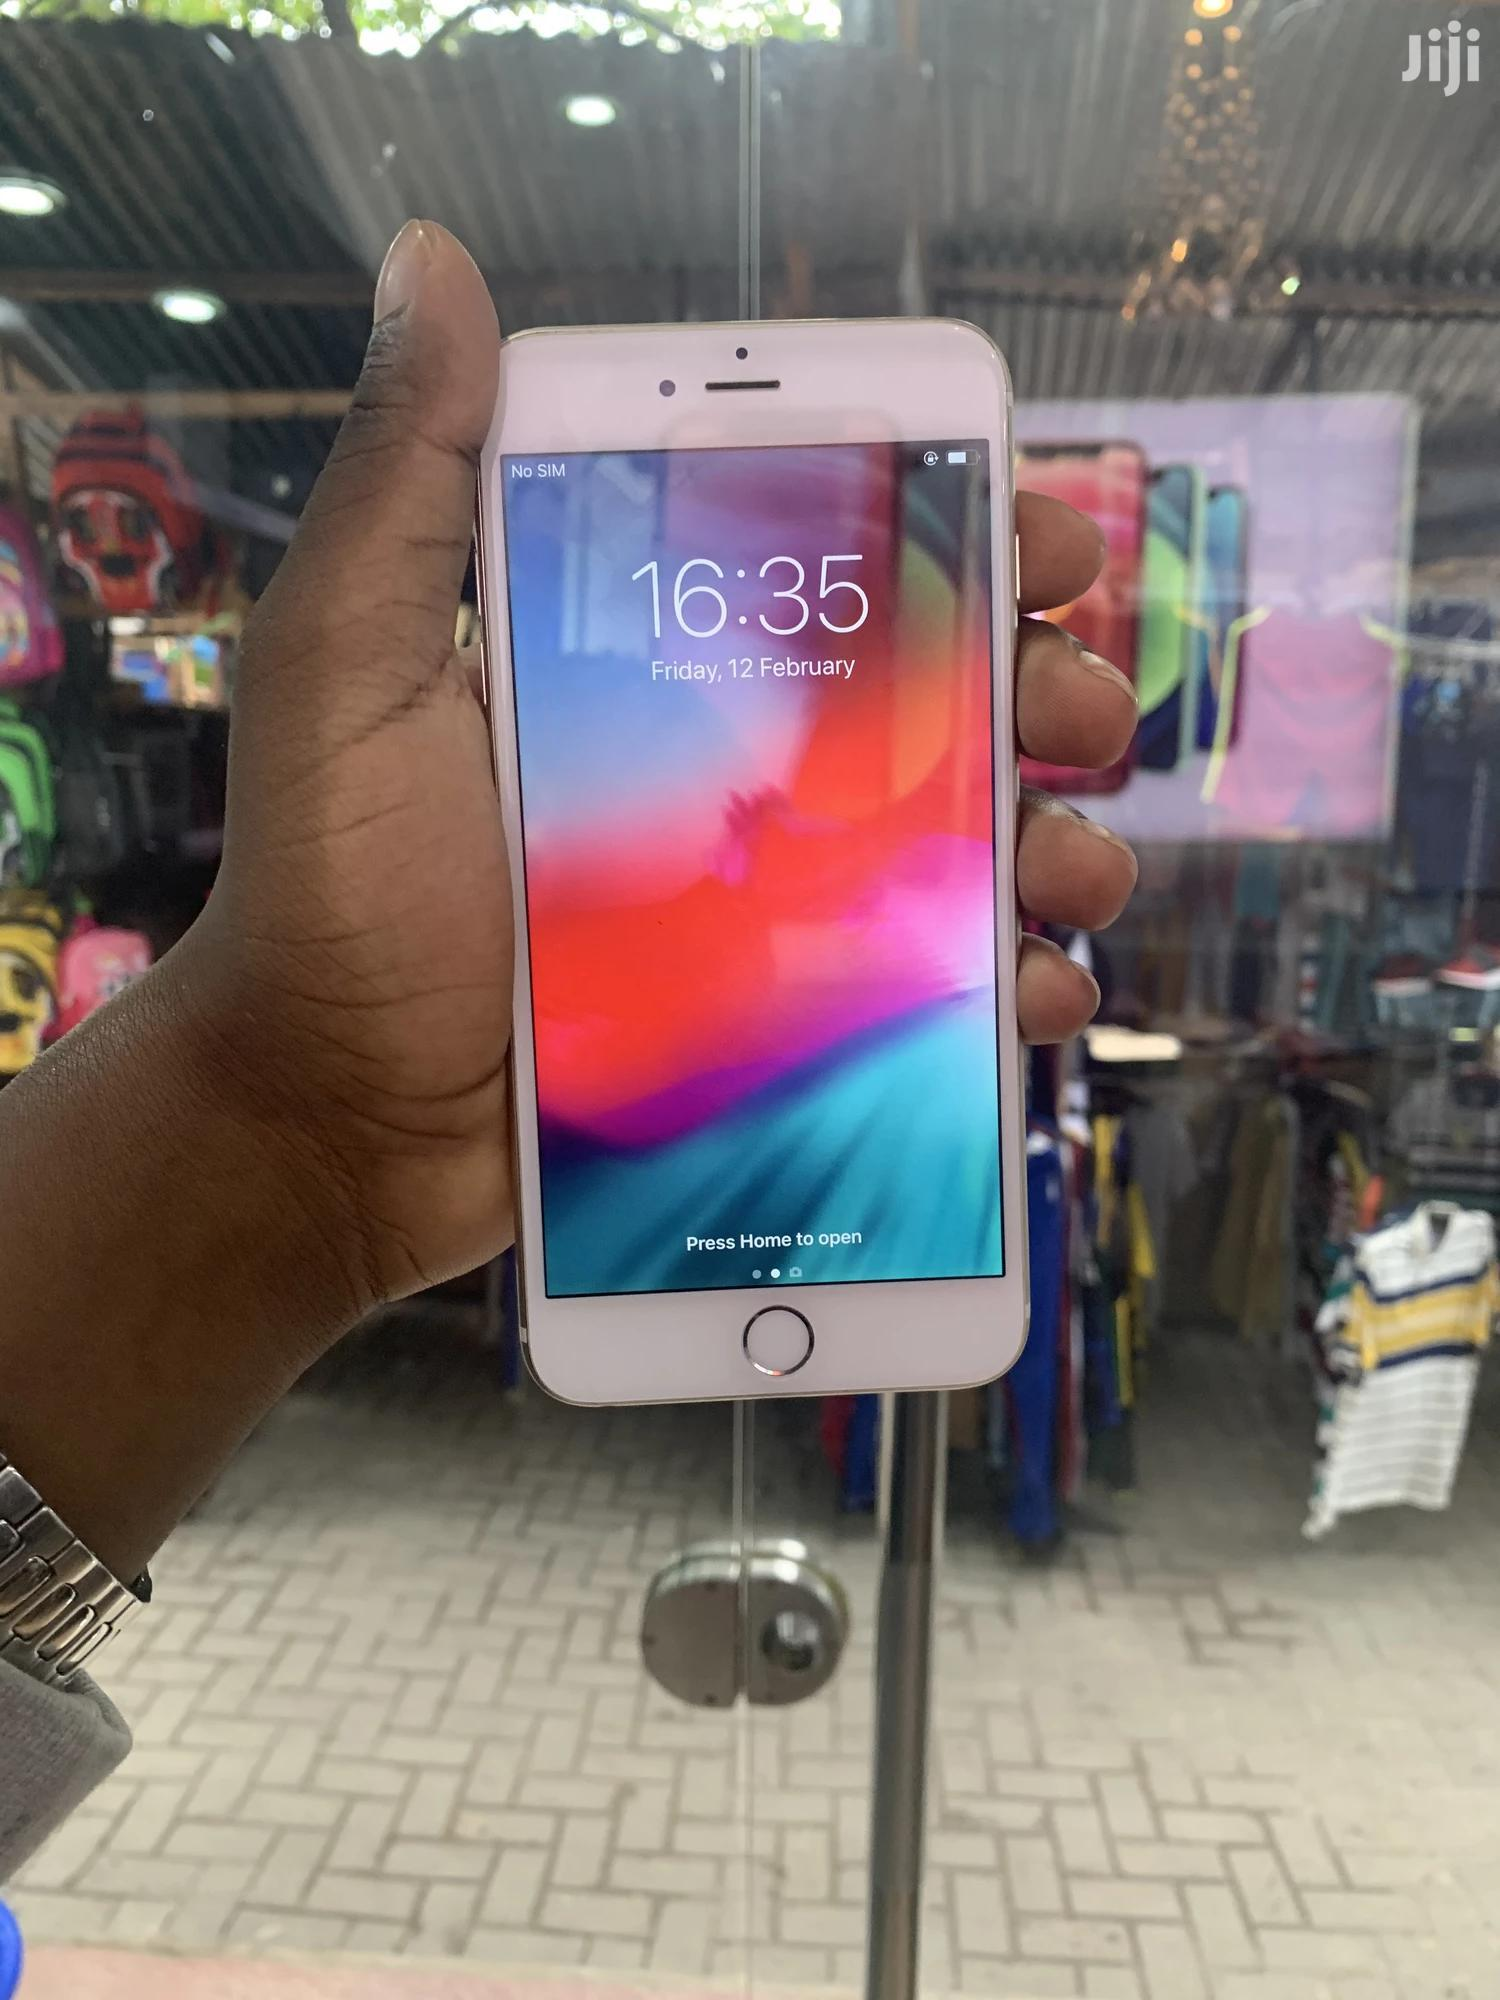 Apple iPhone 6 Plus 64 GB Gold   Mobile Phones for sale in Kinondoni, Dar es Salaam, Tanzania